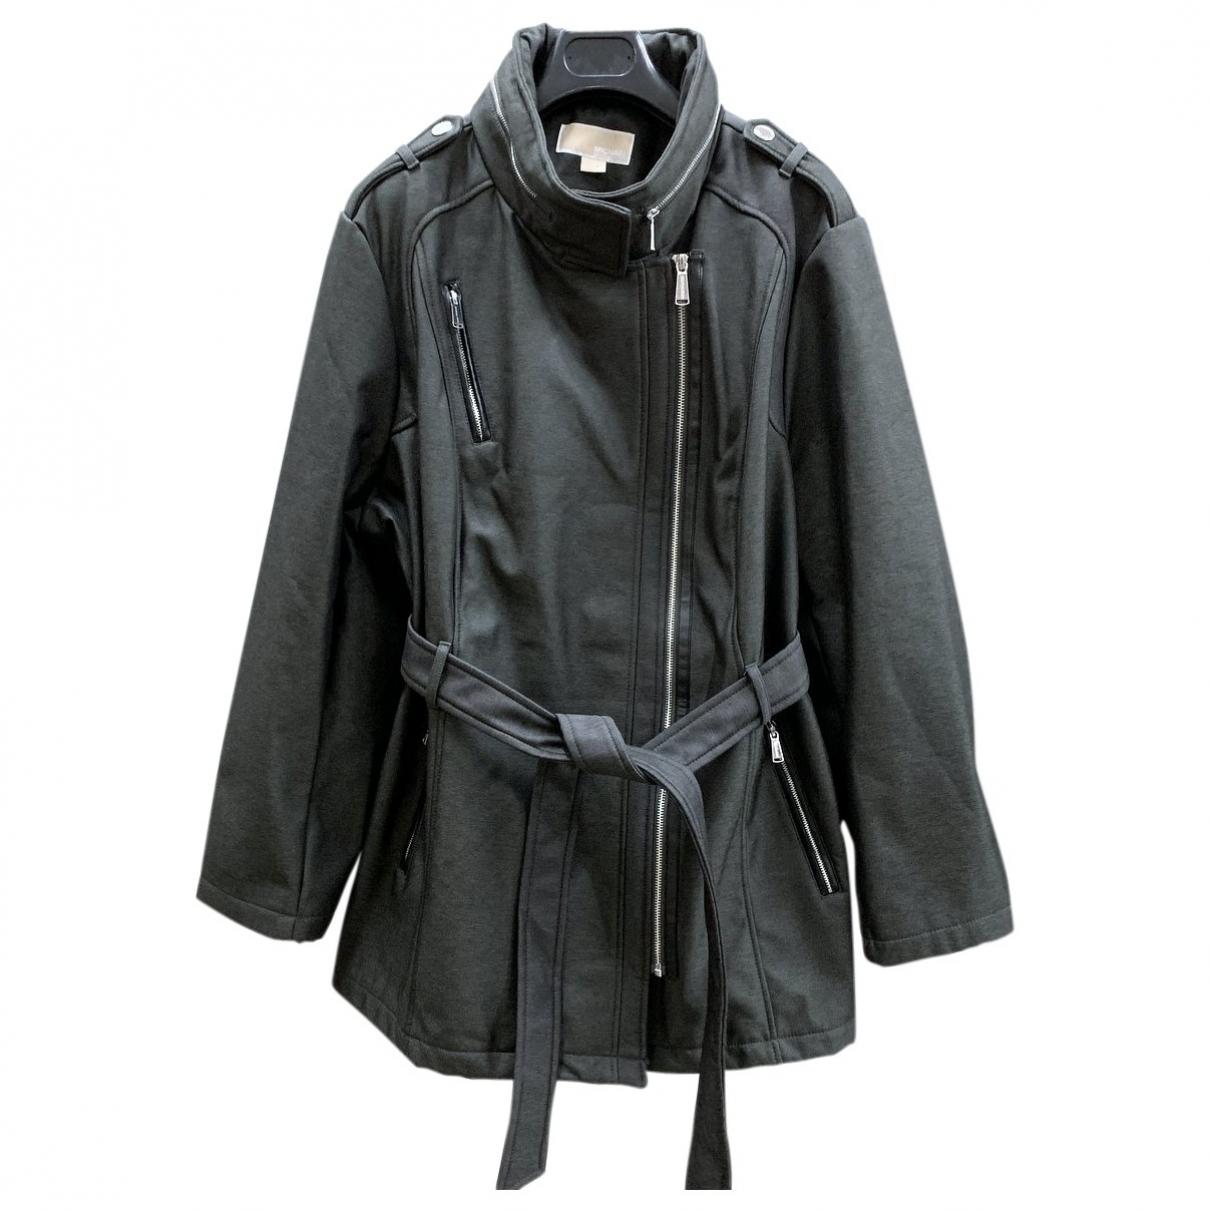 Michael Kors \N Grey coat for Women XXL International